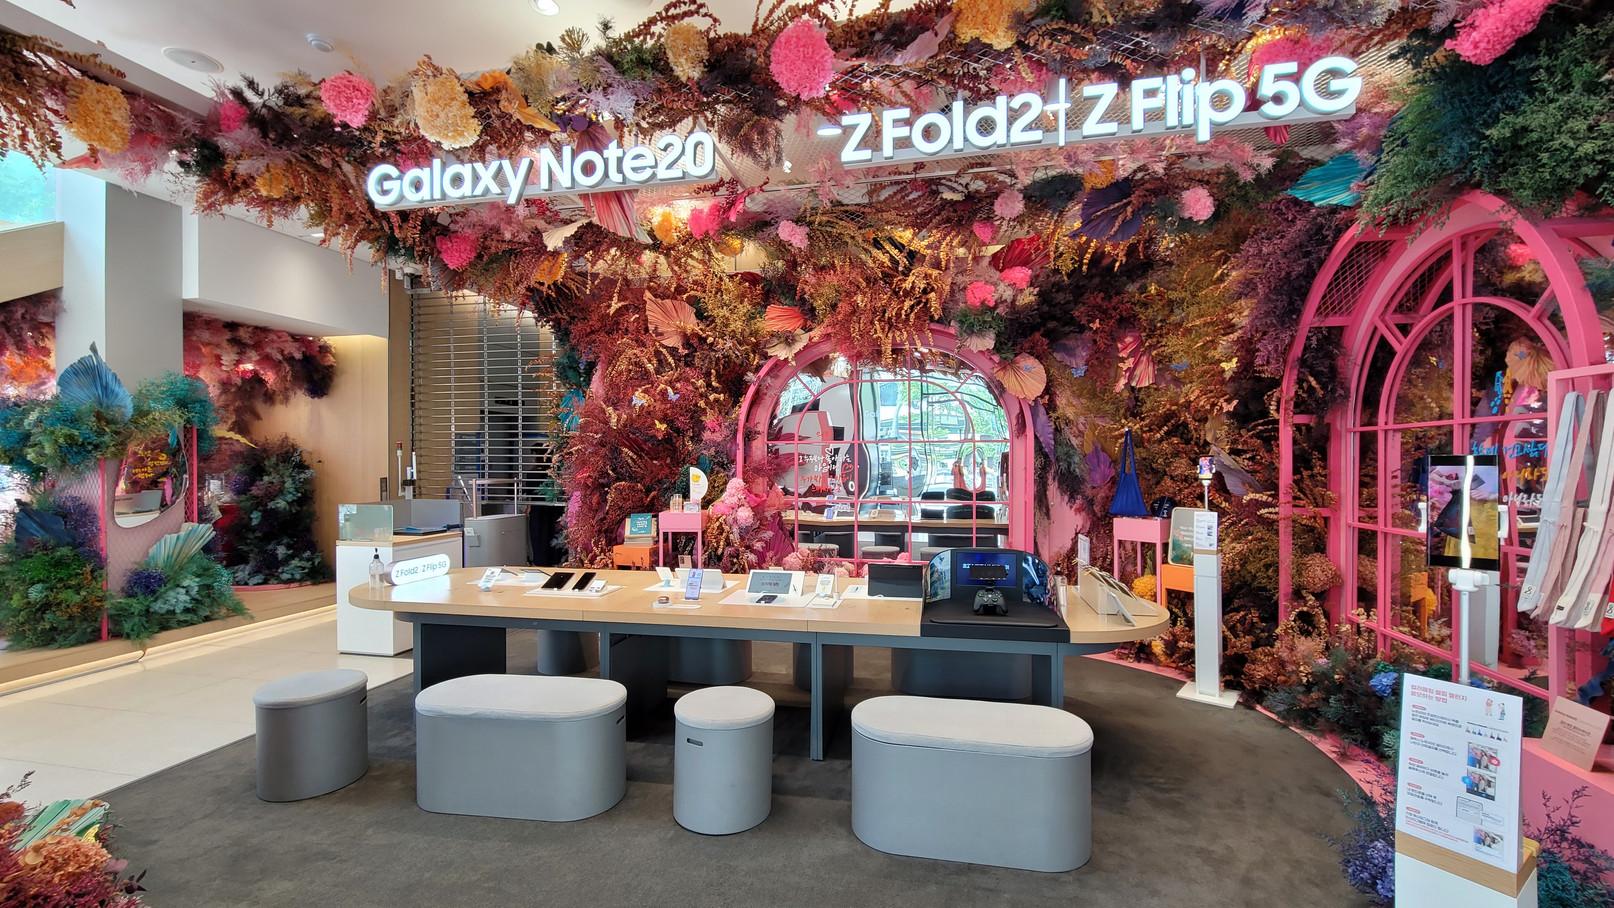 Galaxy Note20 Studio